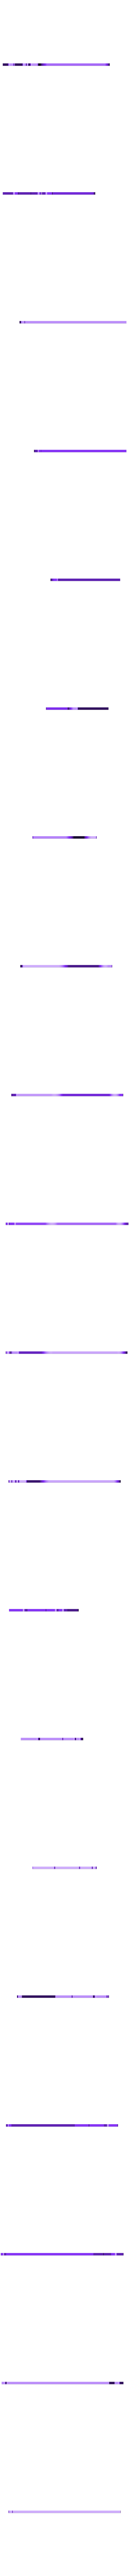 Escuadra_12_cm_v1.stl Download free STL file Shelf bracket set for single track slot • 3D printer design, dancingchicken